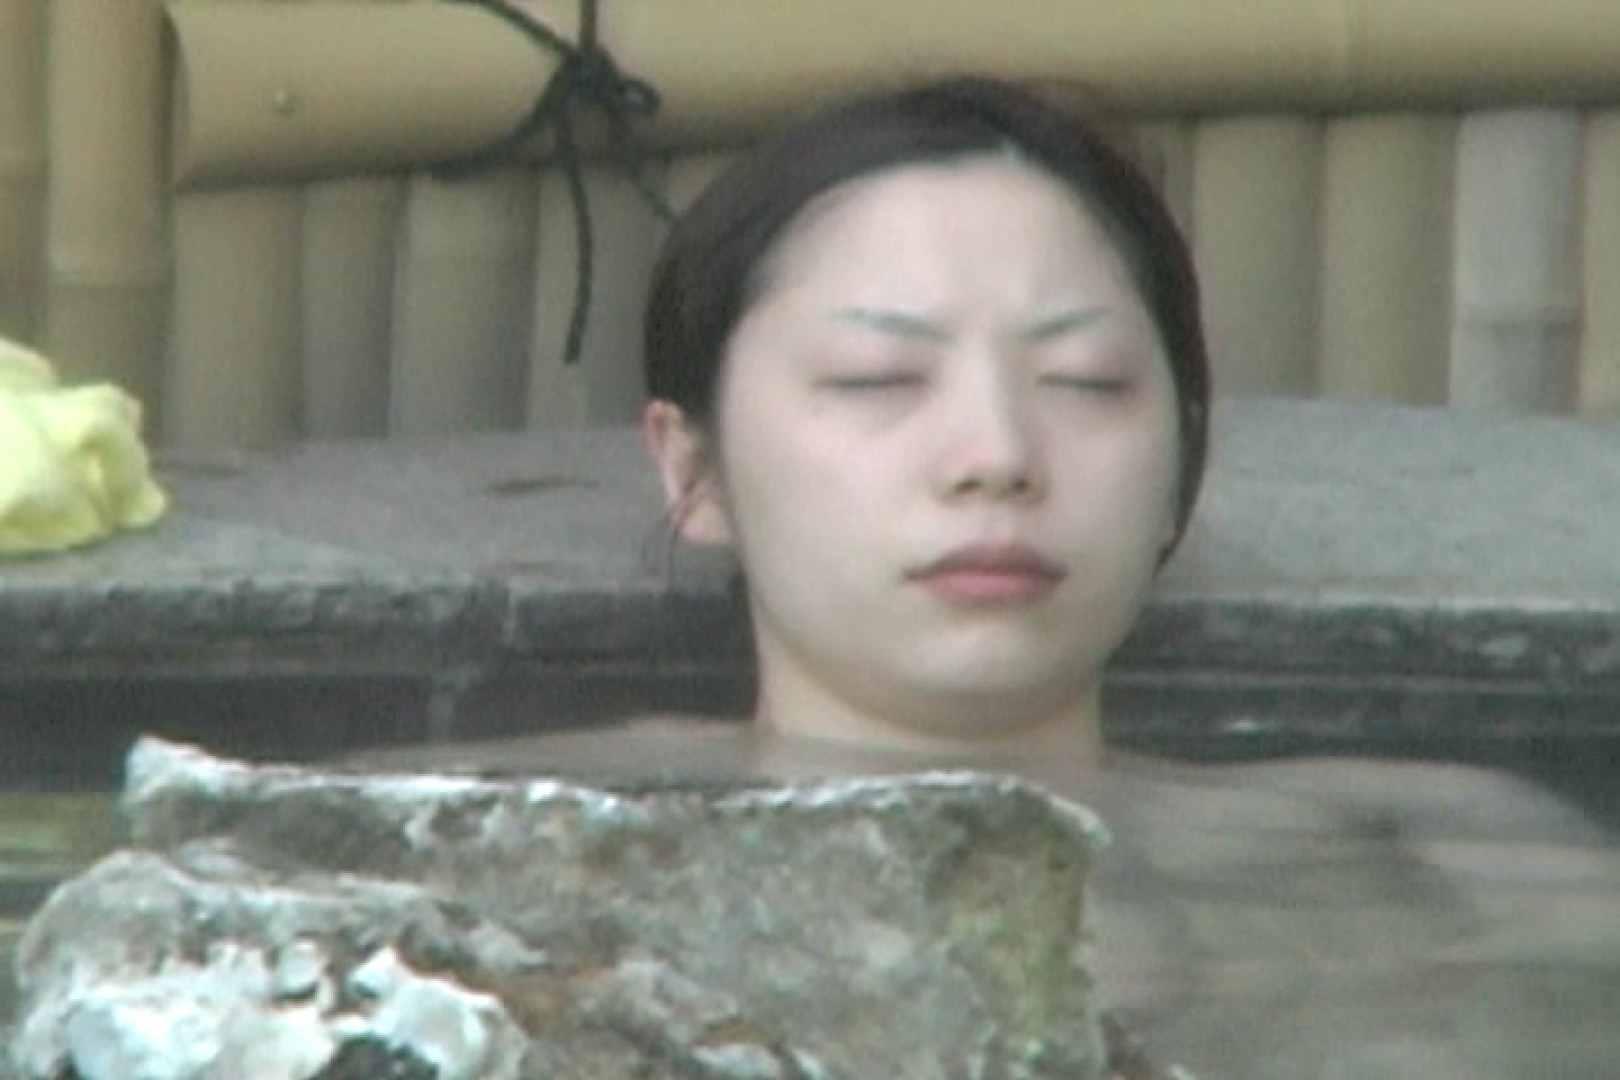 Aquaな露天風呂Vol.596 盗撮シリーズ | 露天風呂編  113PIX 55